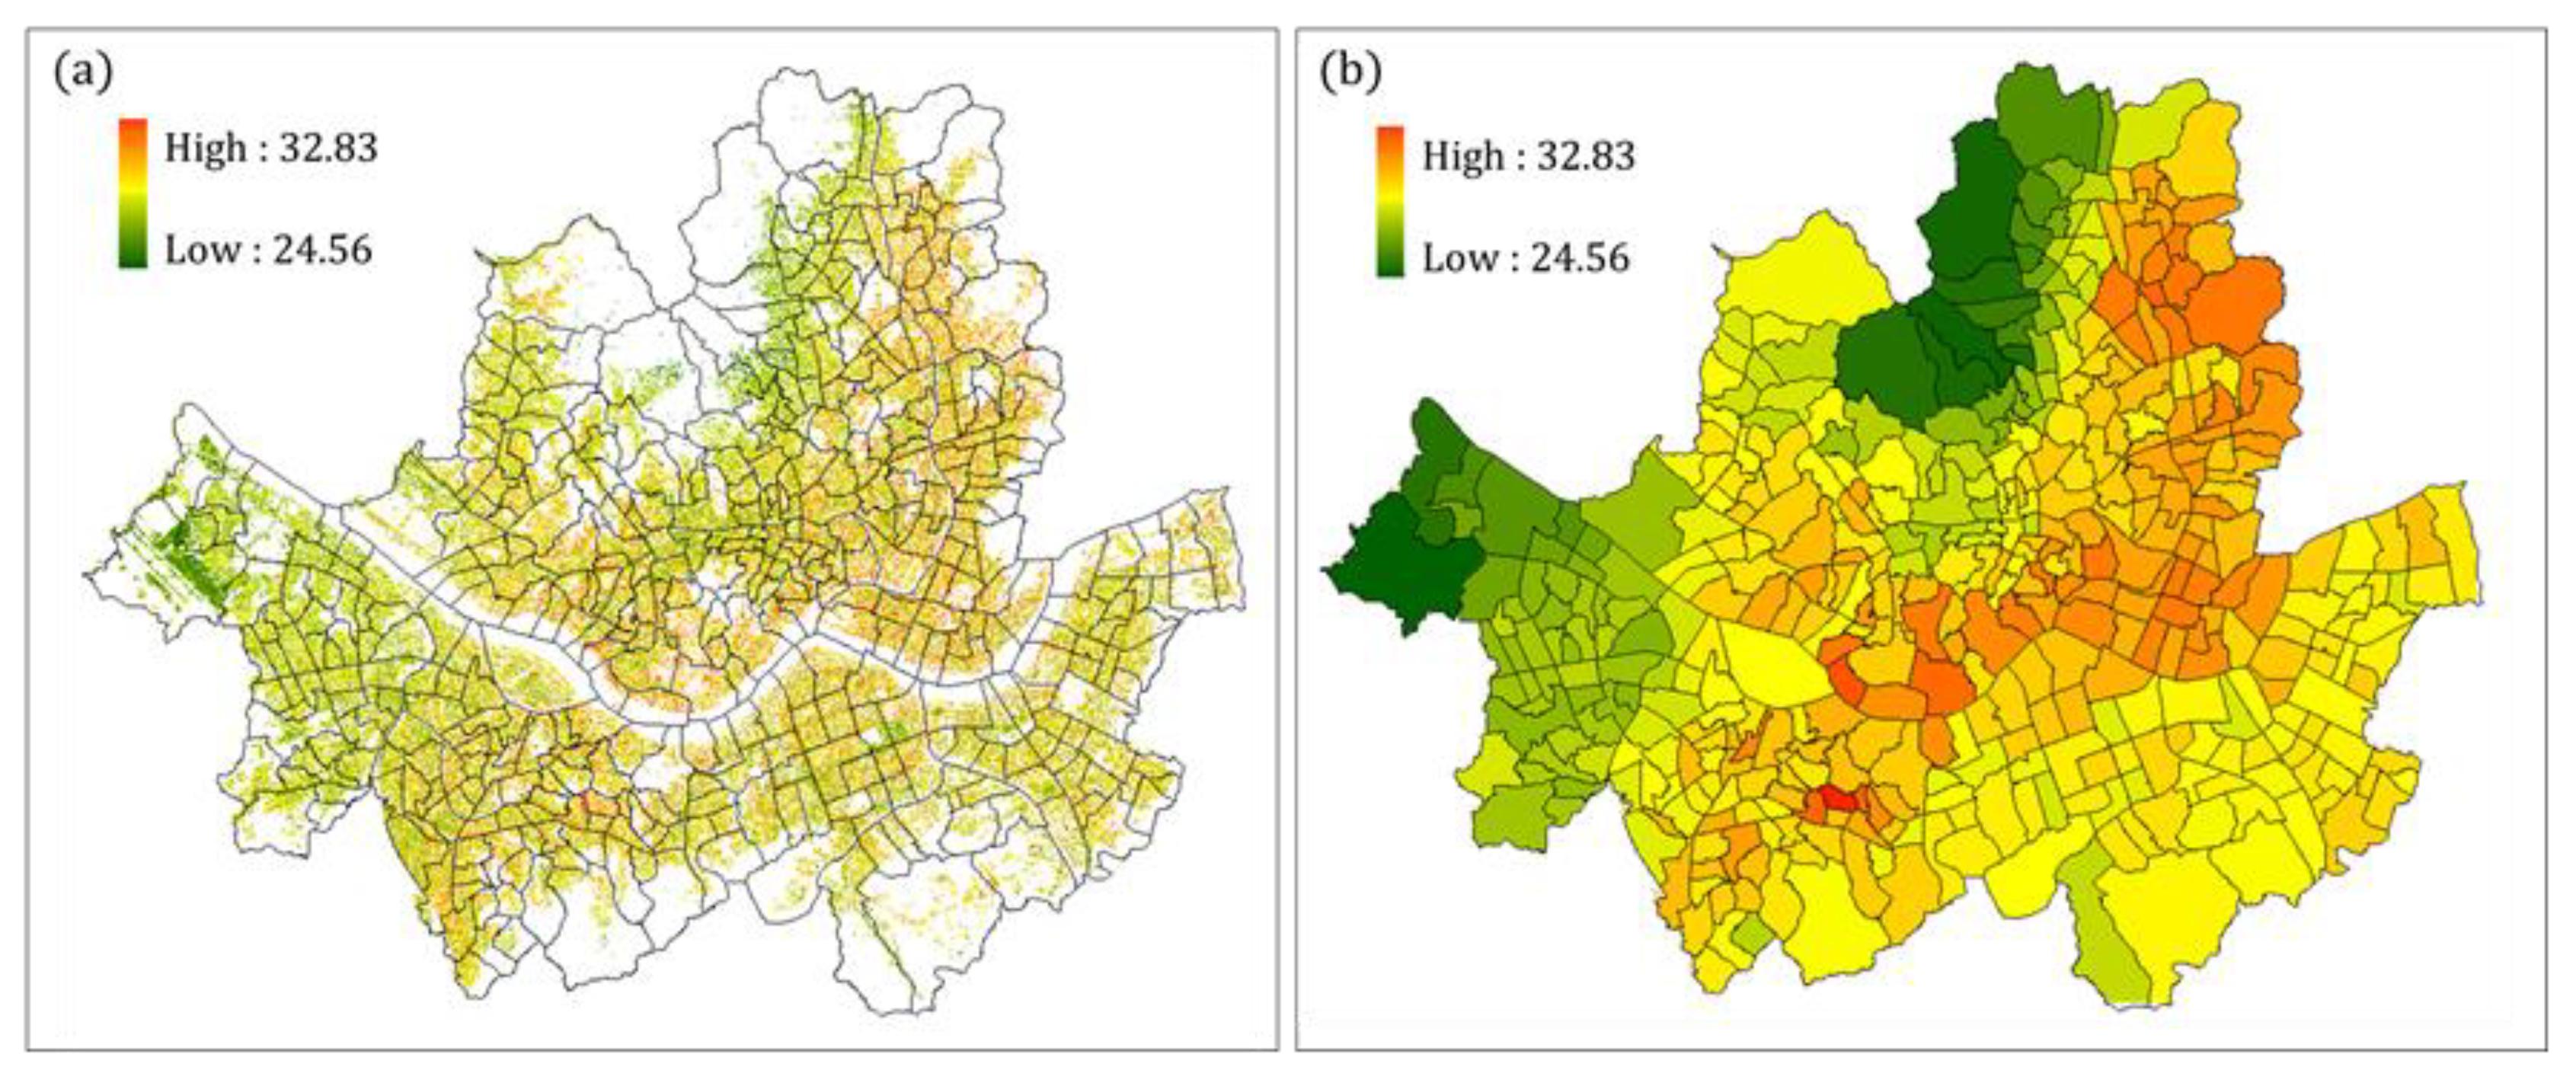 Atmosphere | Free Full-Text | Development of an Urban High ...